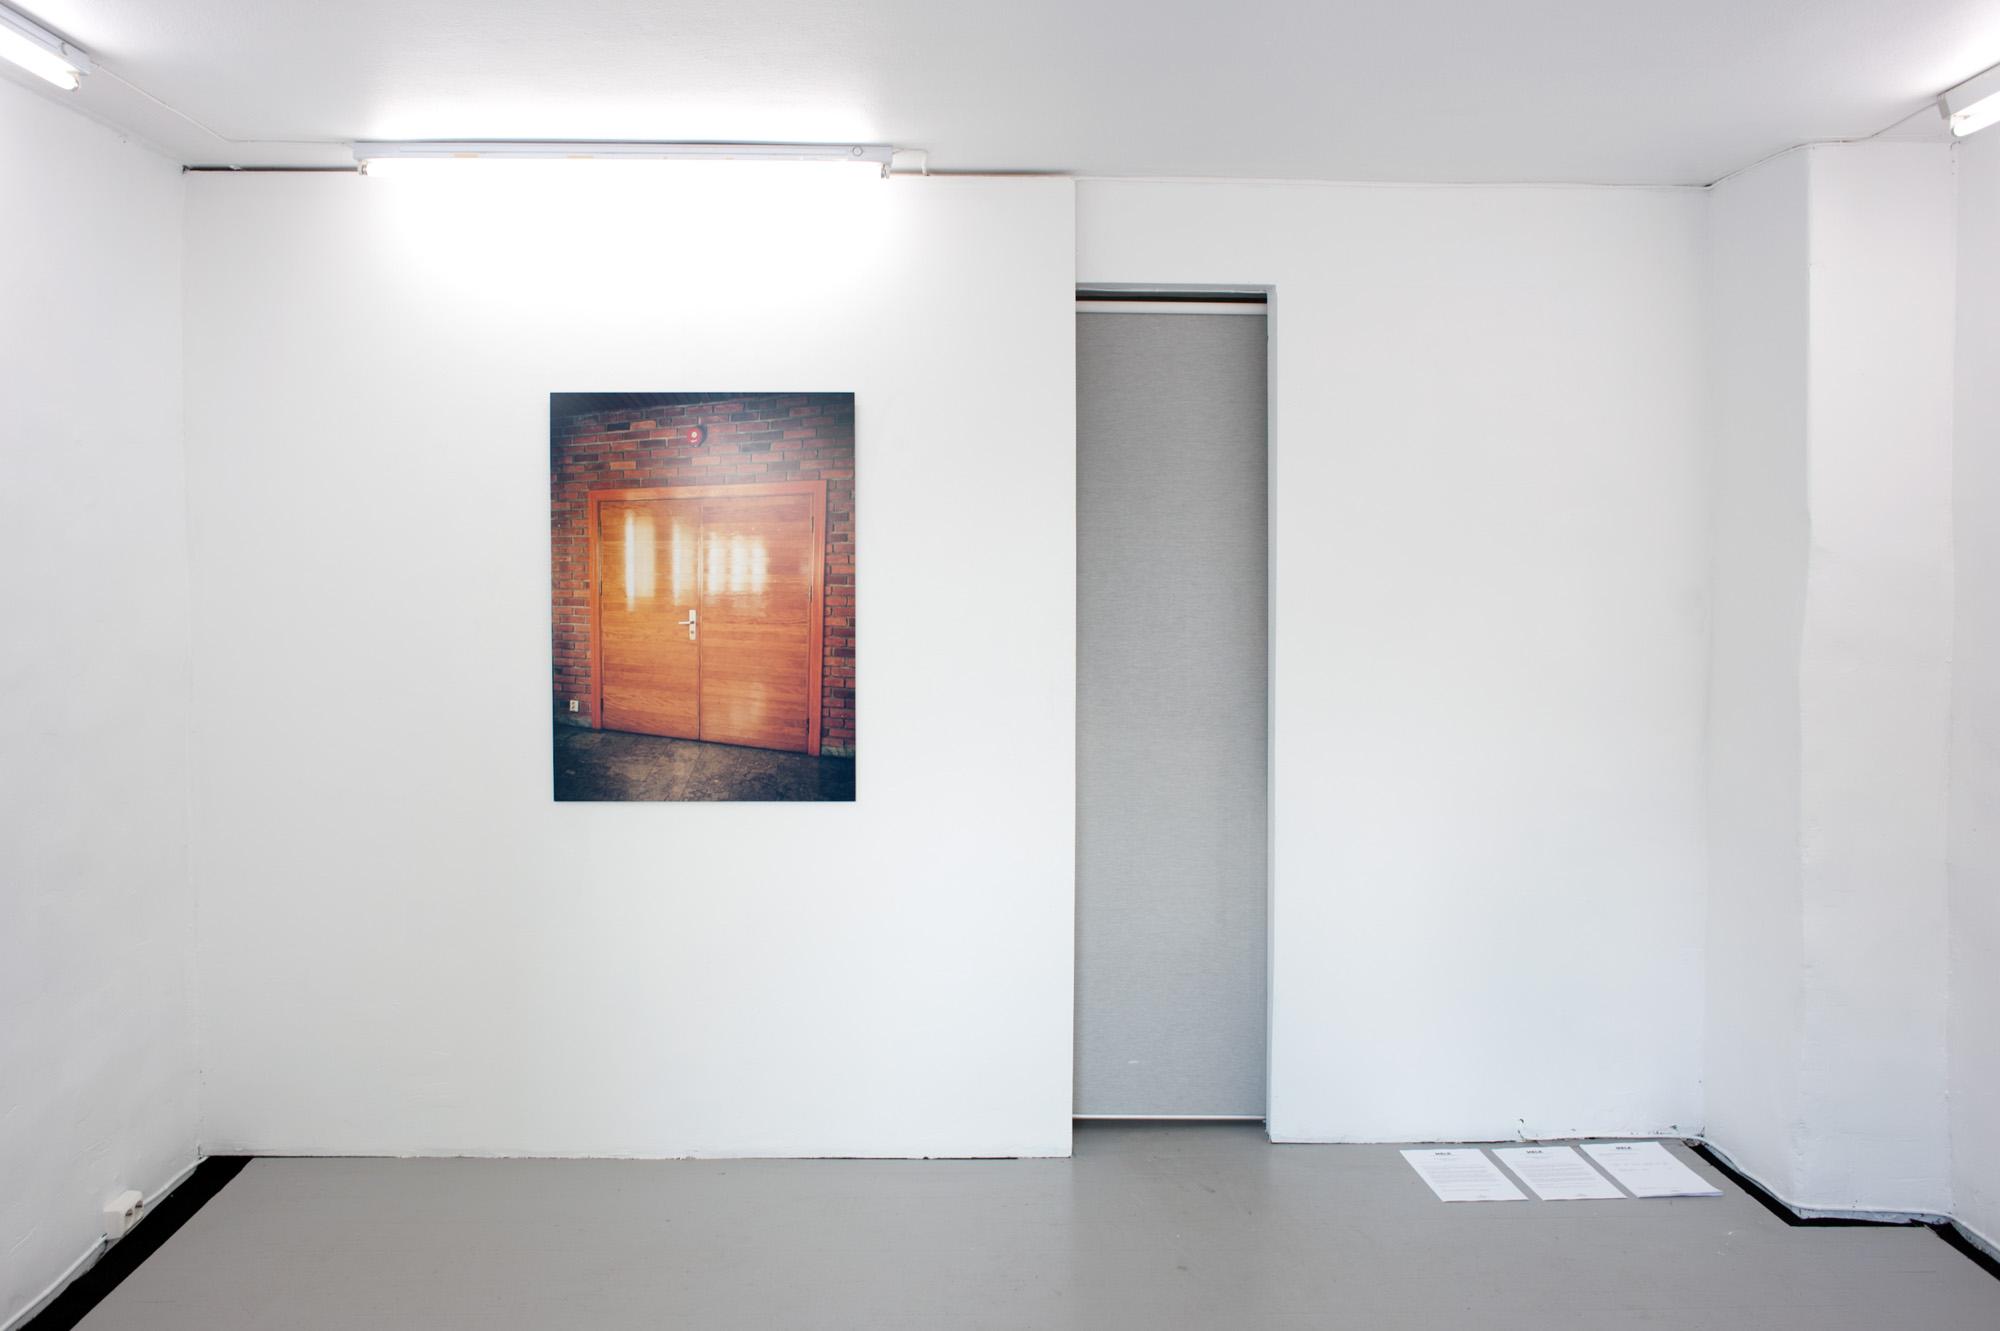 Verena Winkelmann - Photography as a serial act